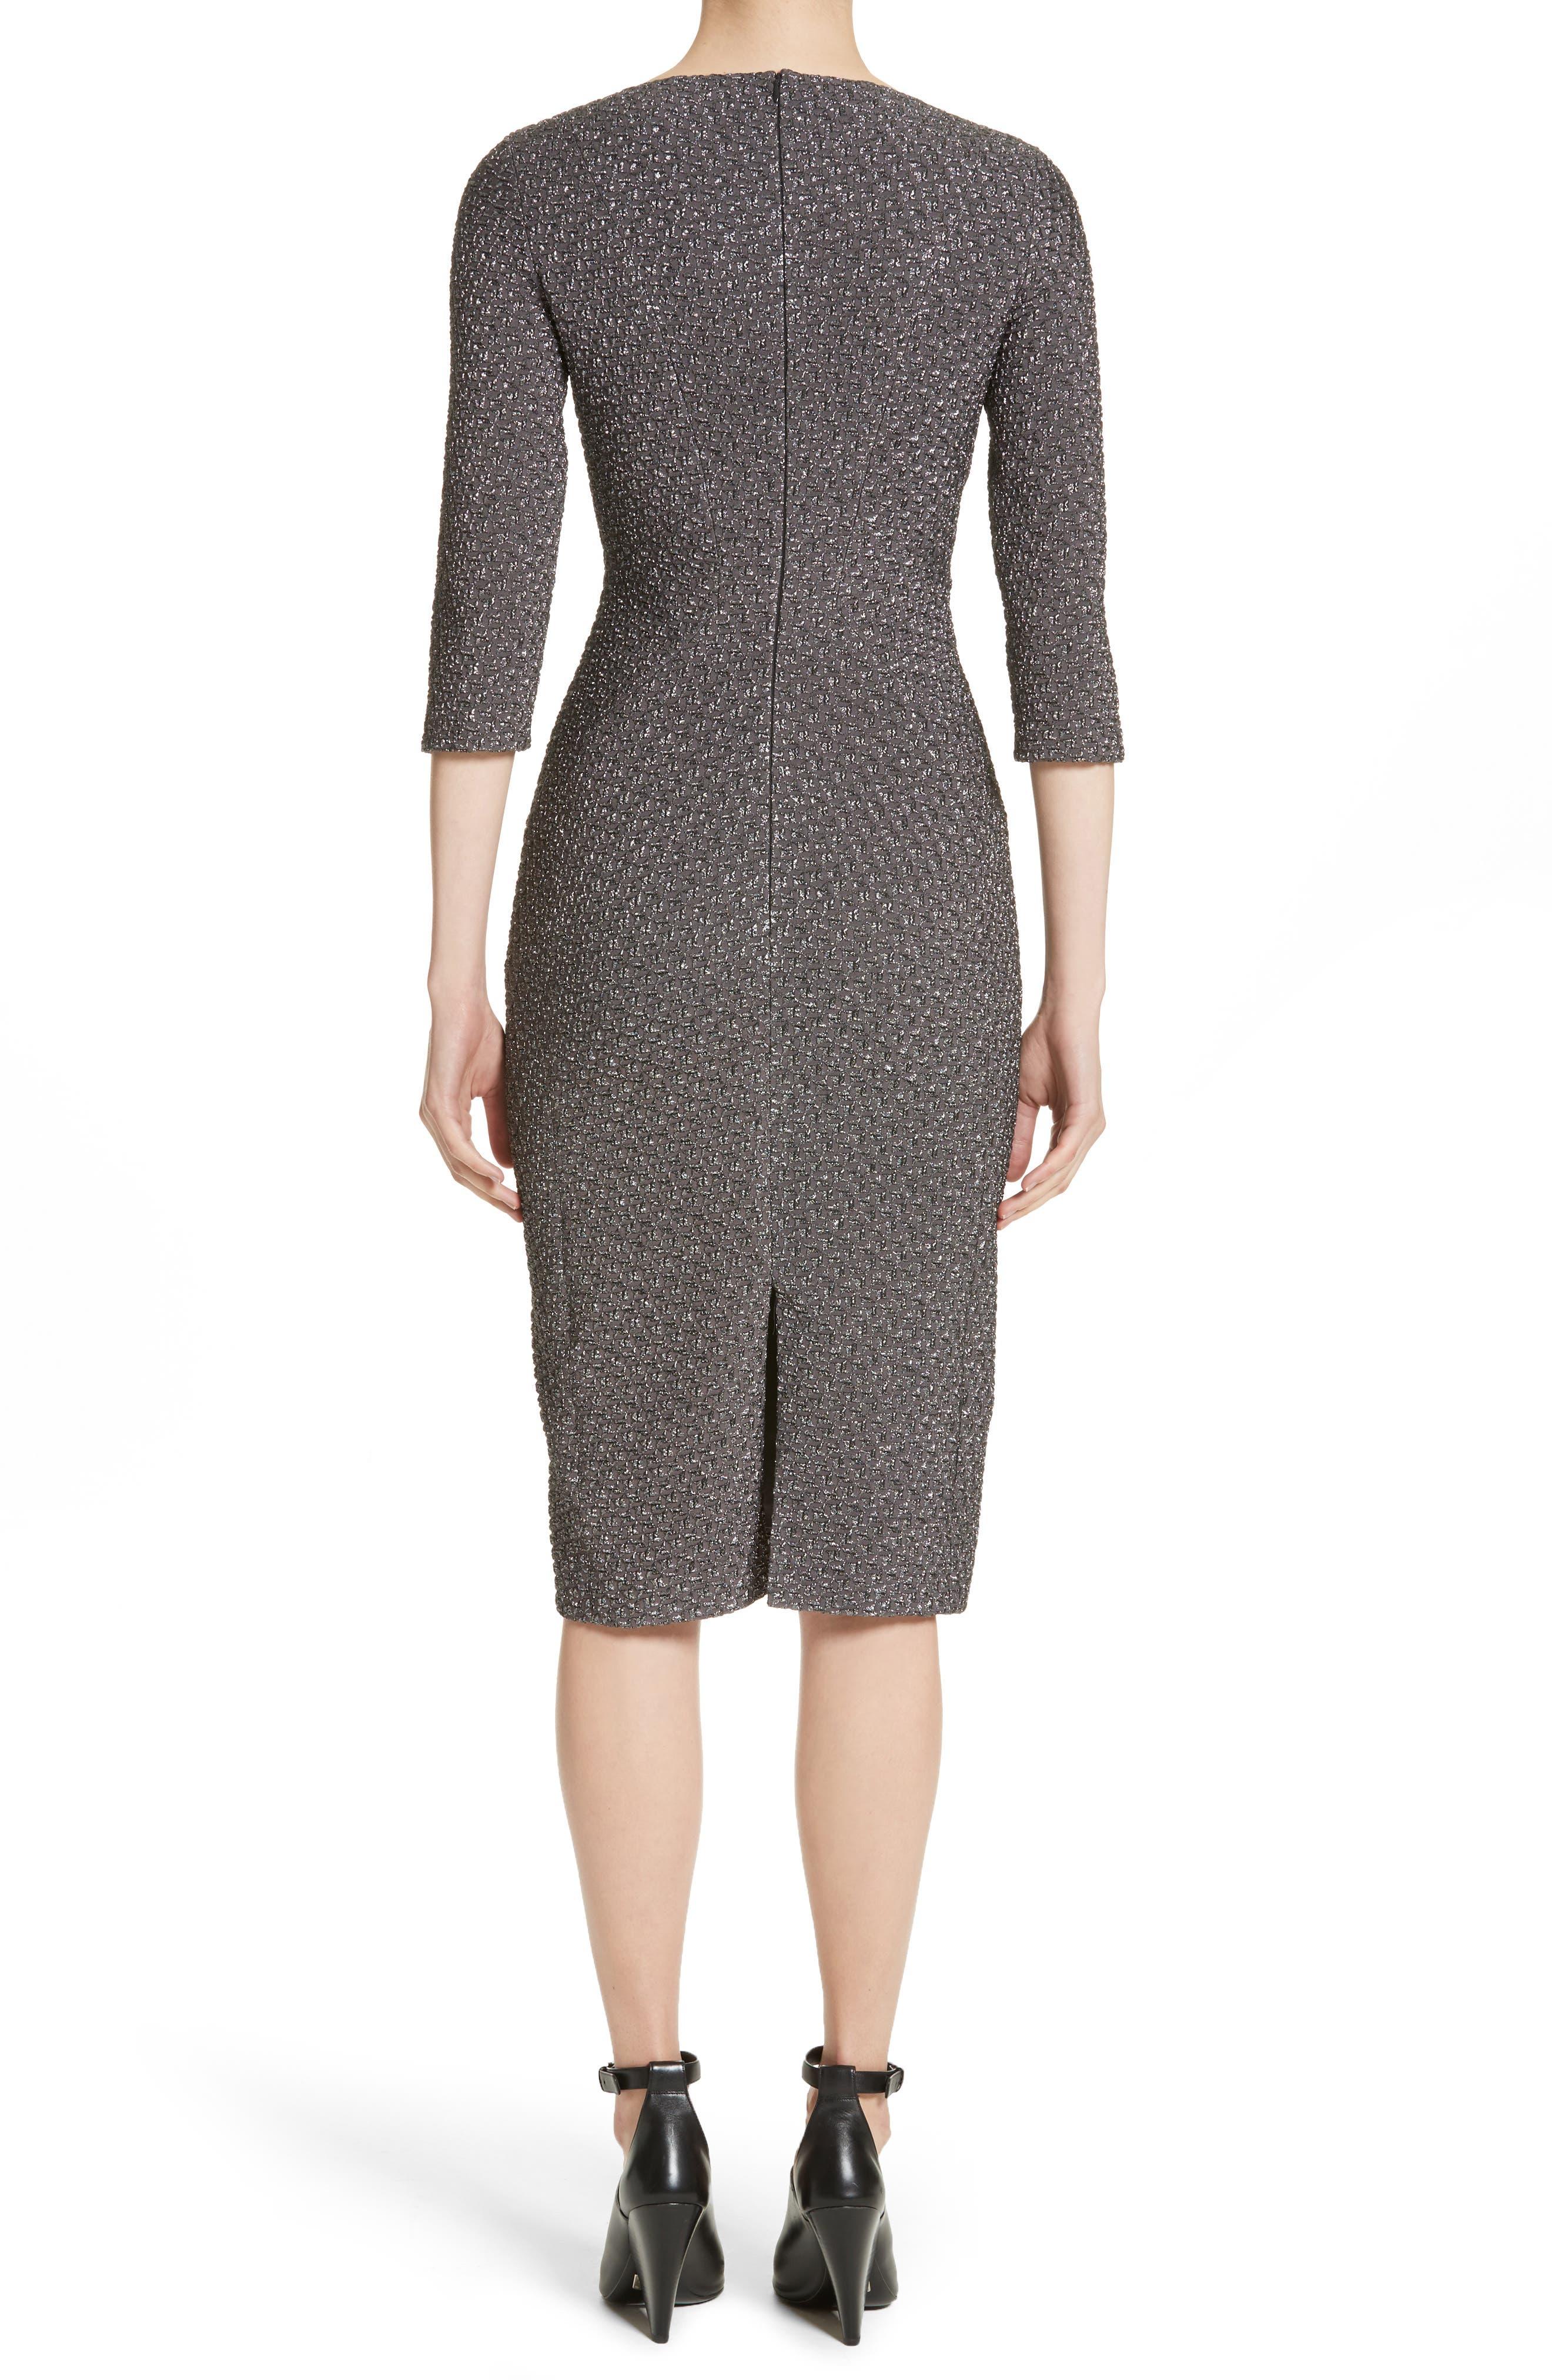 Houndstooth Stretch Metallic Jacquard Sheath Dress,                             Alternate thumbnail 2, color,                             029